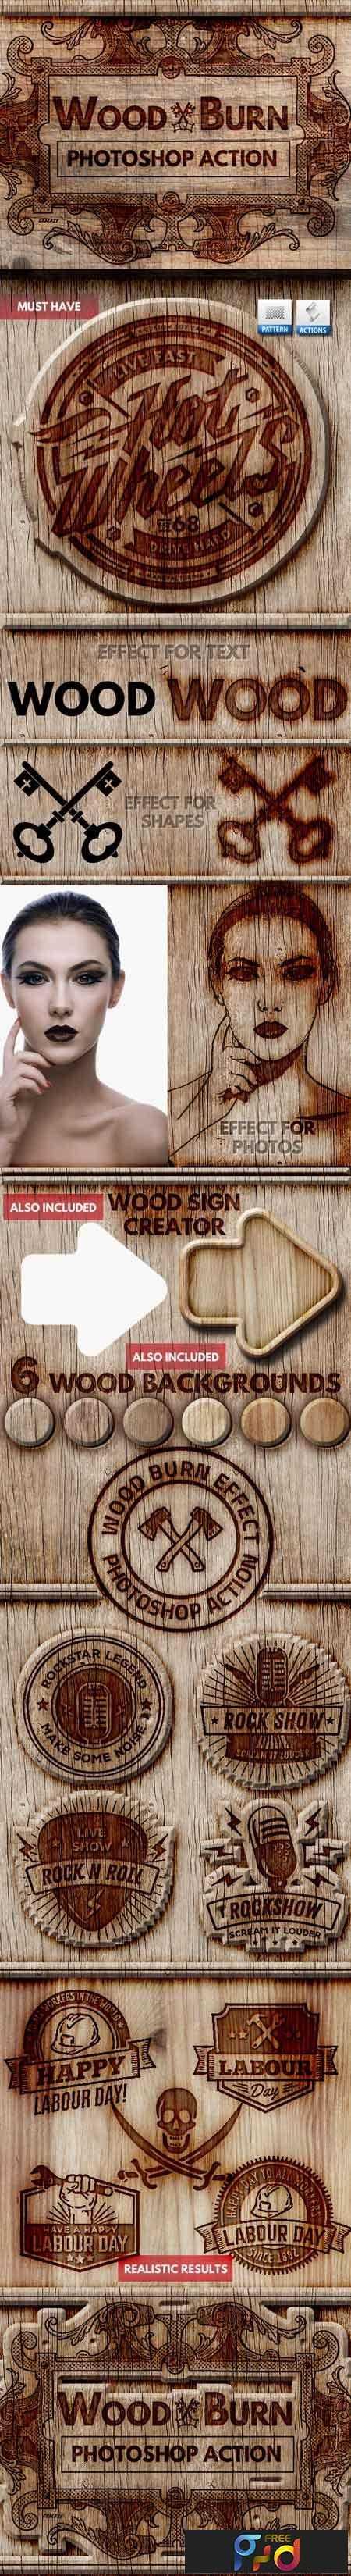 1808060 Wood Burn Effect Photoshop Action 22089411 1